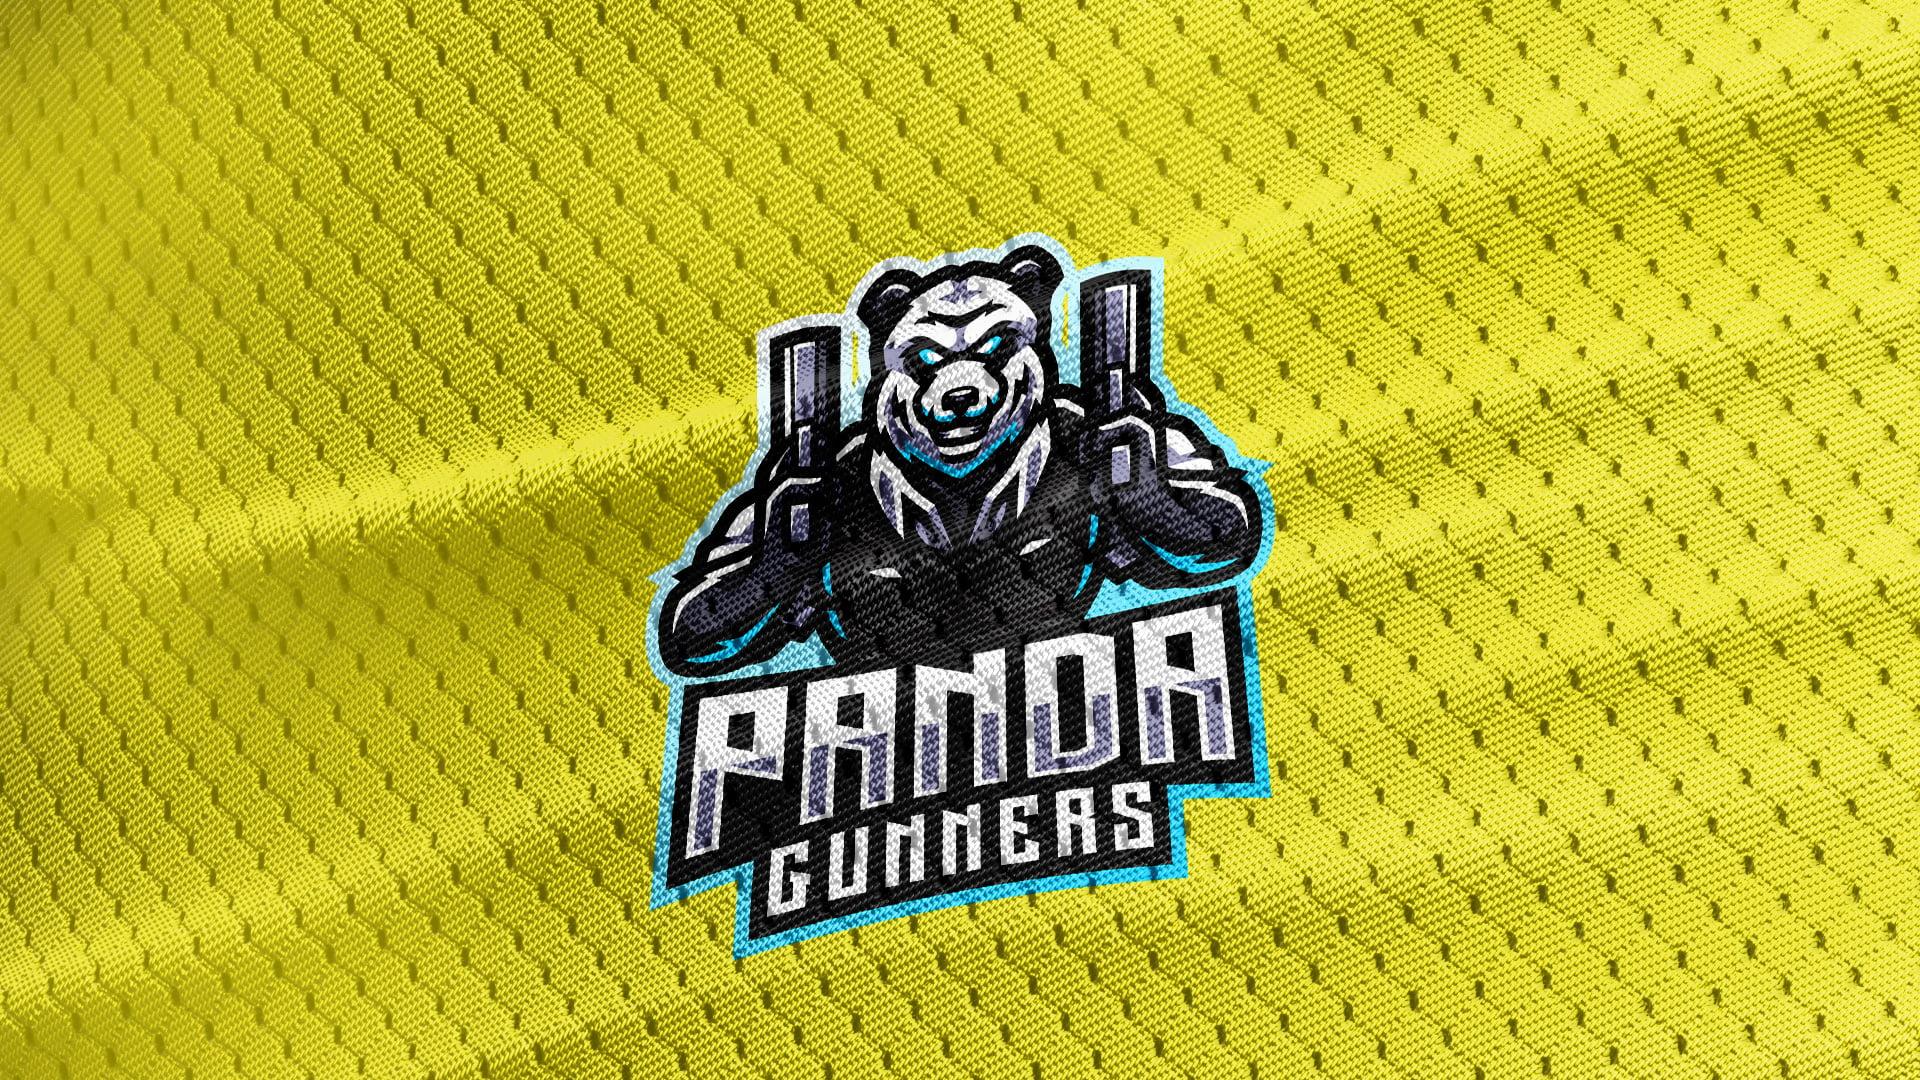 Yellow-Jersey-Texture-Free-Download-Panda-Bear-Mascot-Logo